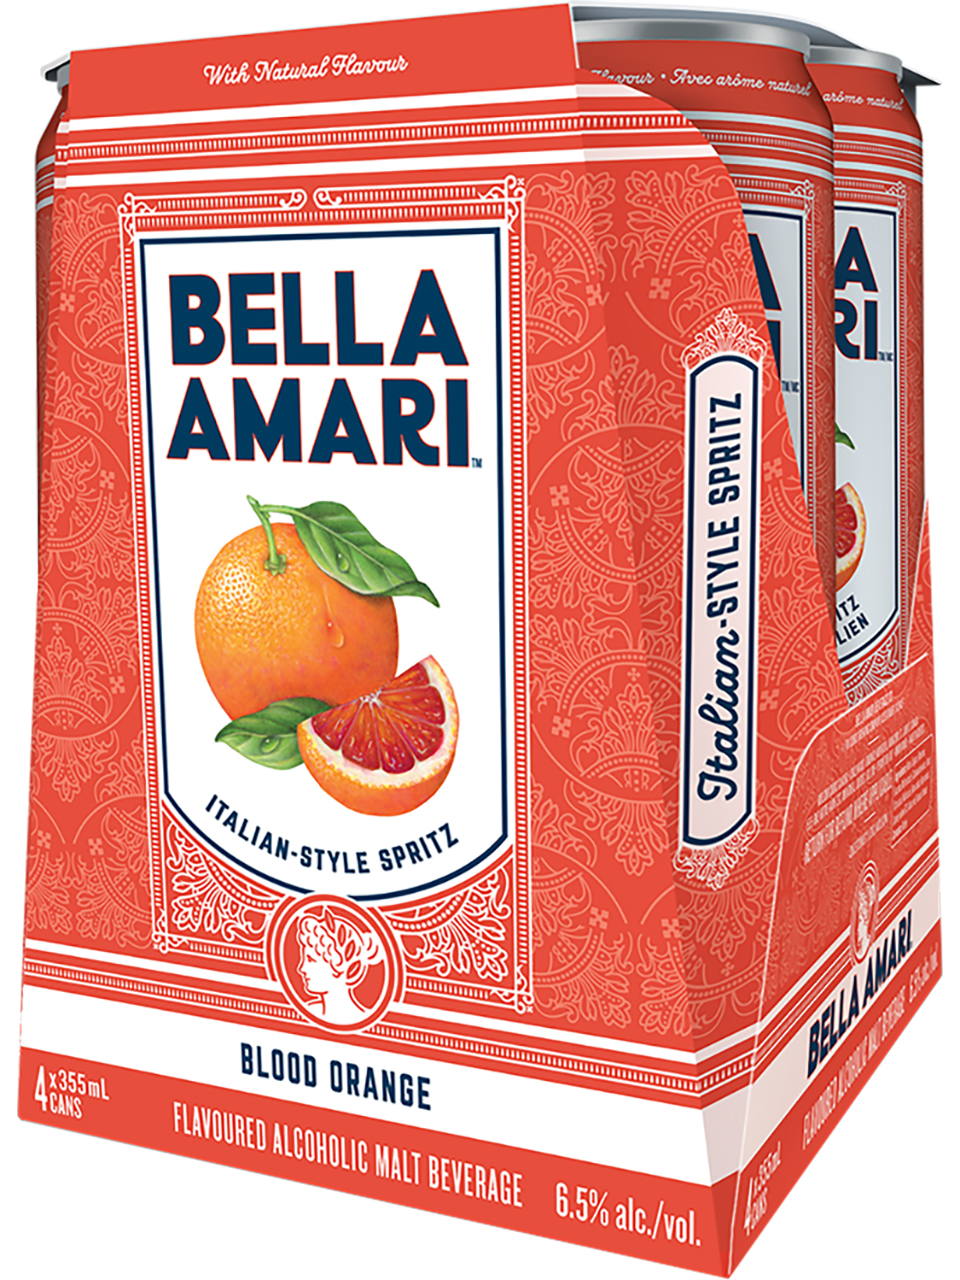 Bella Amari Blood Orange 4 Pack Cans